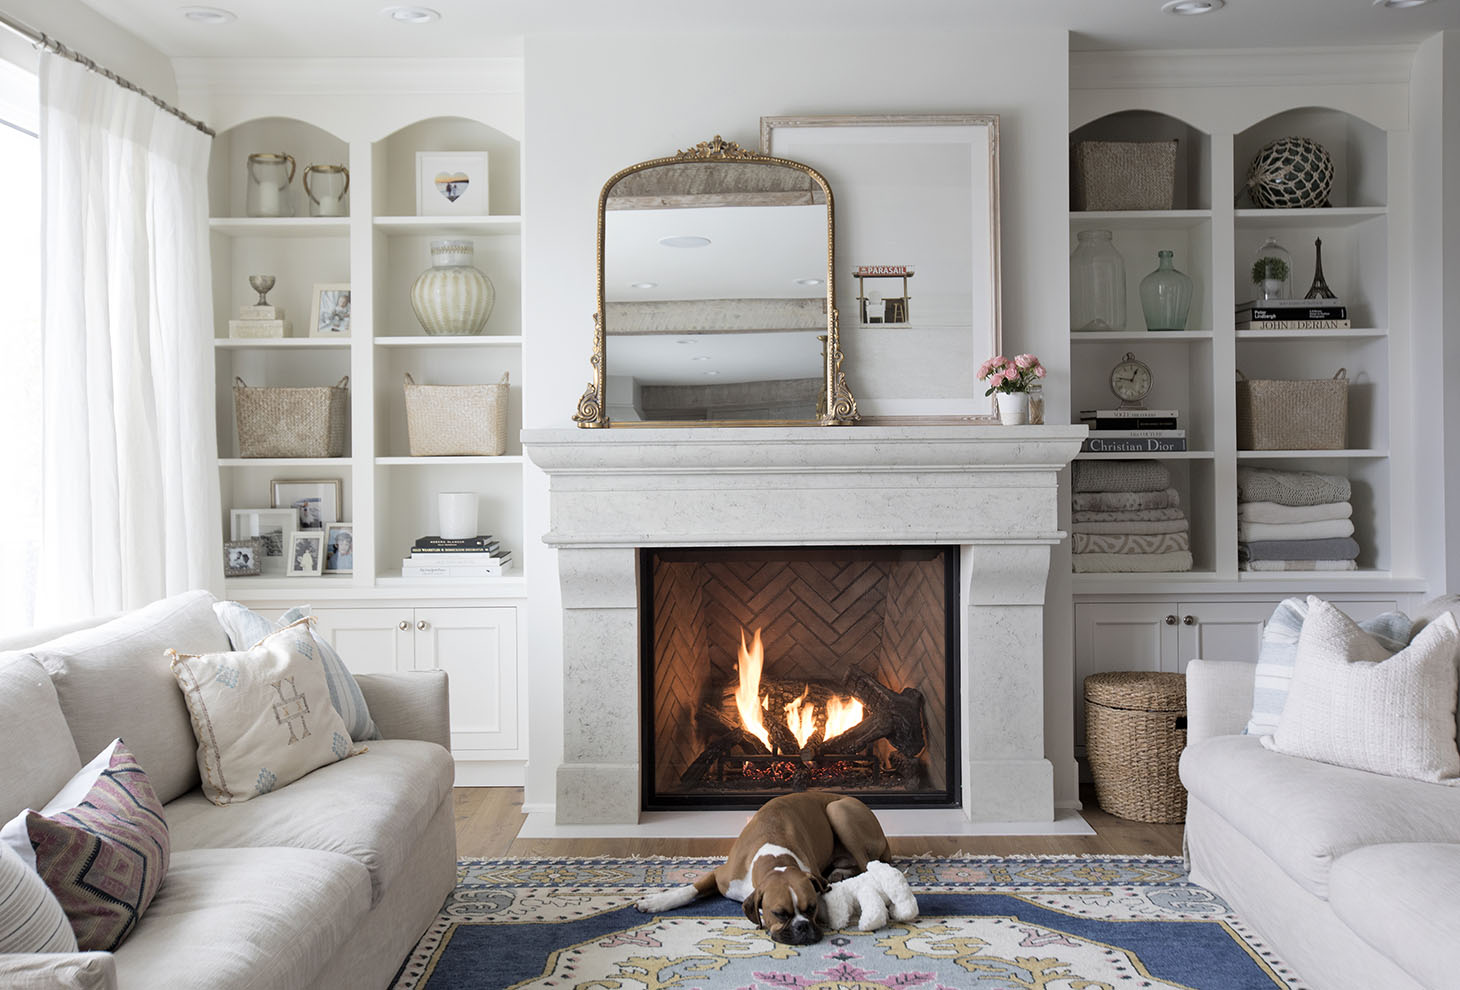 Home Tour Series: Living Room | Jillian Harris | Bloglovin\'